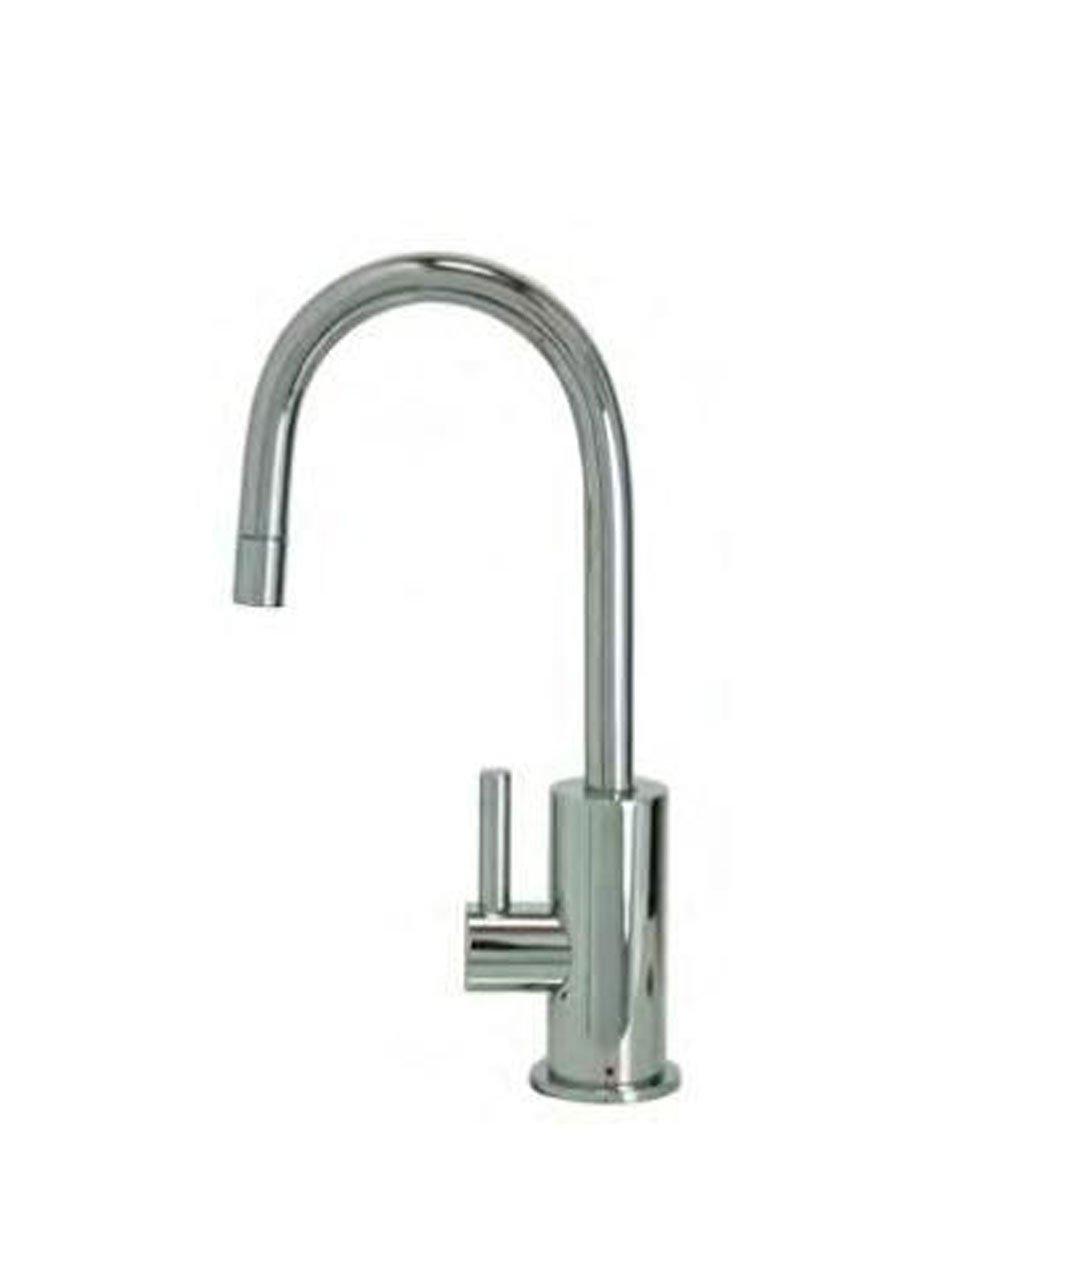 Mountain Plumbing MT1840-NL/CPB Little Gourmet Hot Water Dispenser, Polished Chrome by Mountain Plumbing